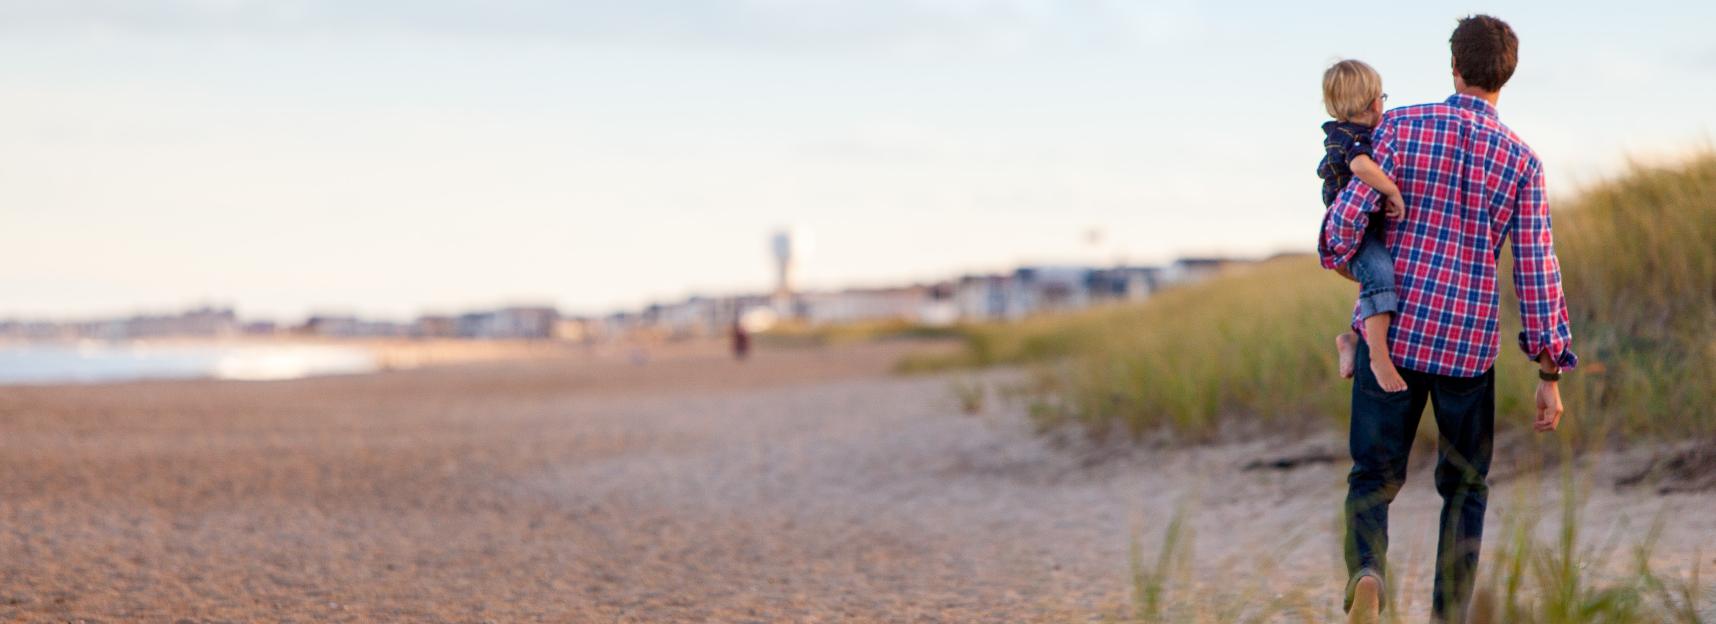 Refinance-Home-Loan-Dad-Son-New-Beach-Home-Mortgage-Loan